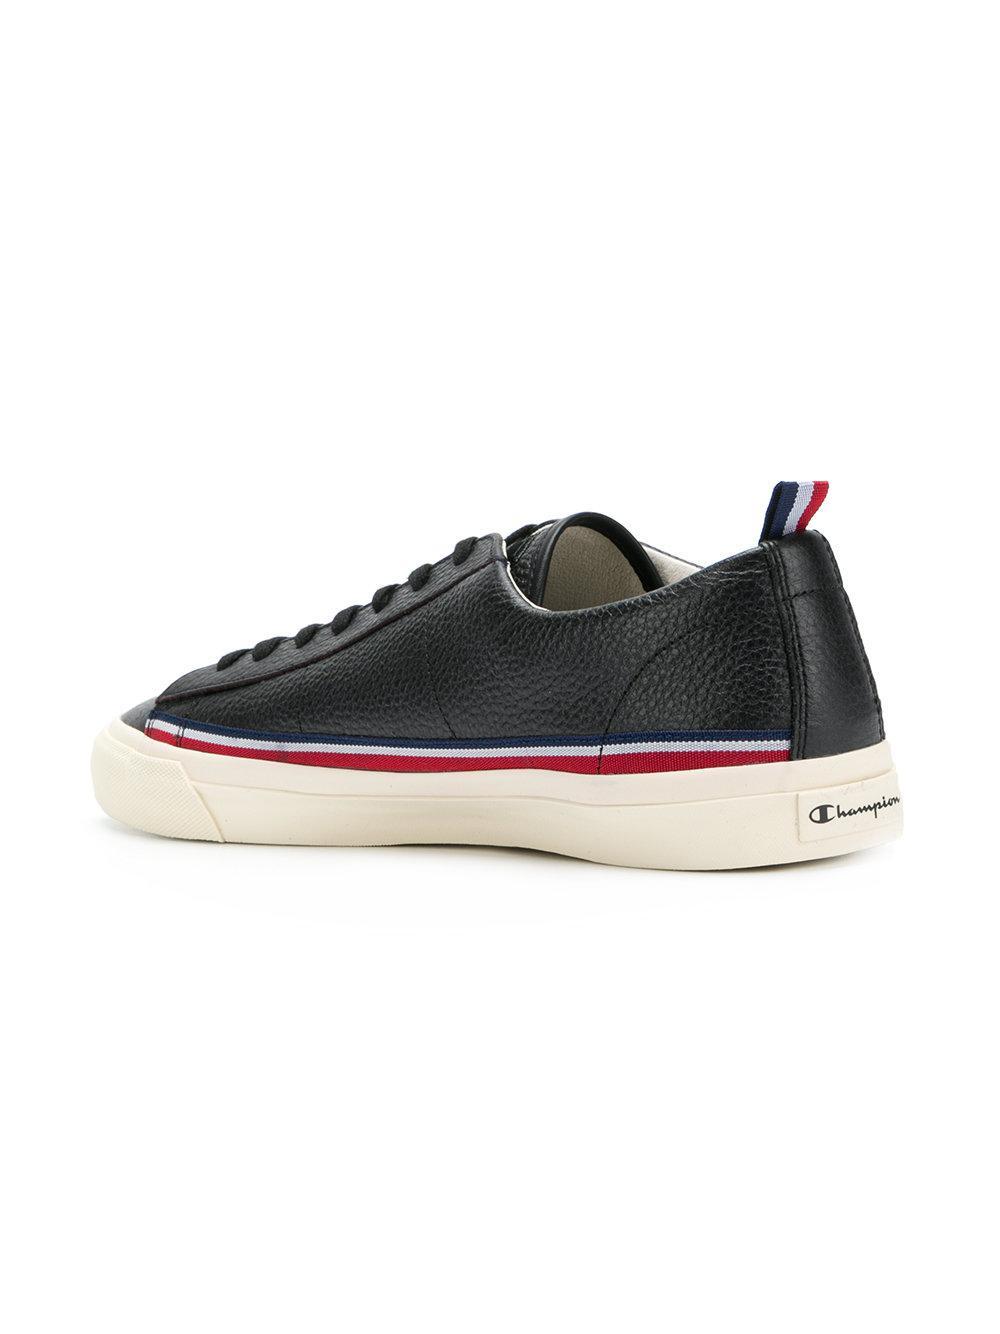 4a2f16237e7dd Lyst - Champion Mercury Sneakers in Black for Men